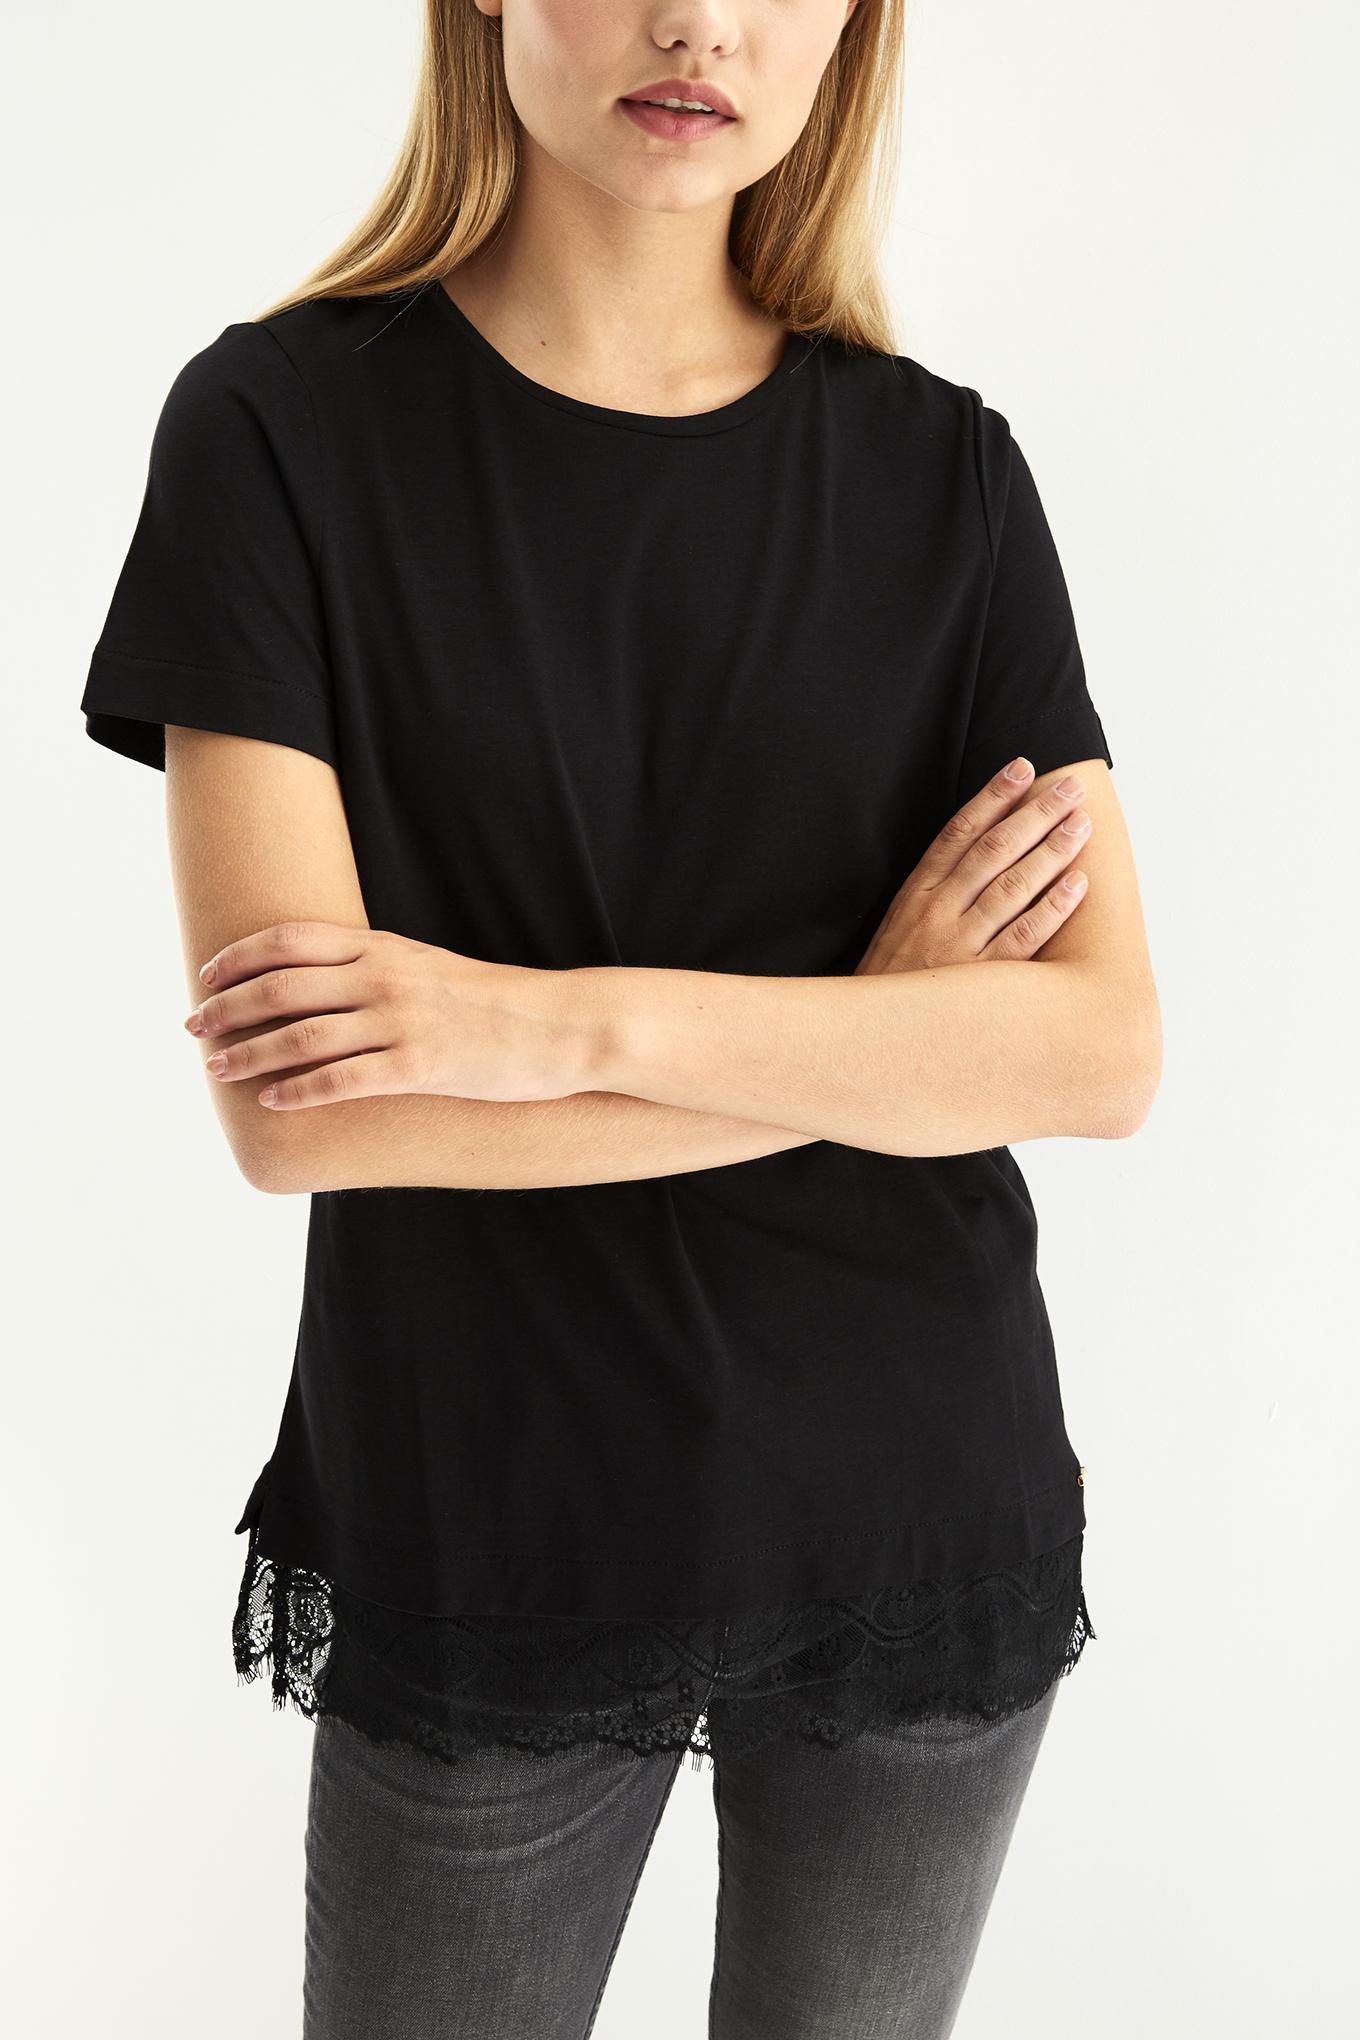 T-Shirt Preto Casual Mulher